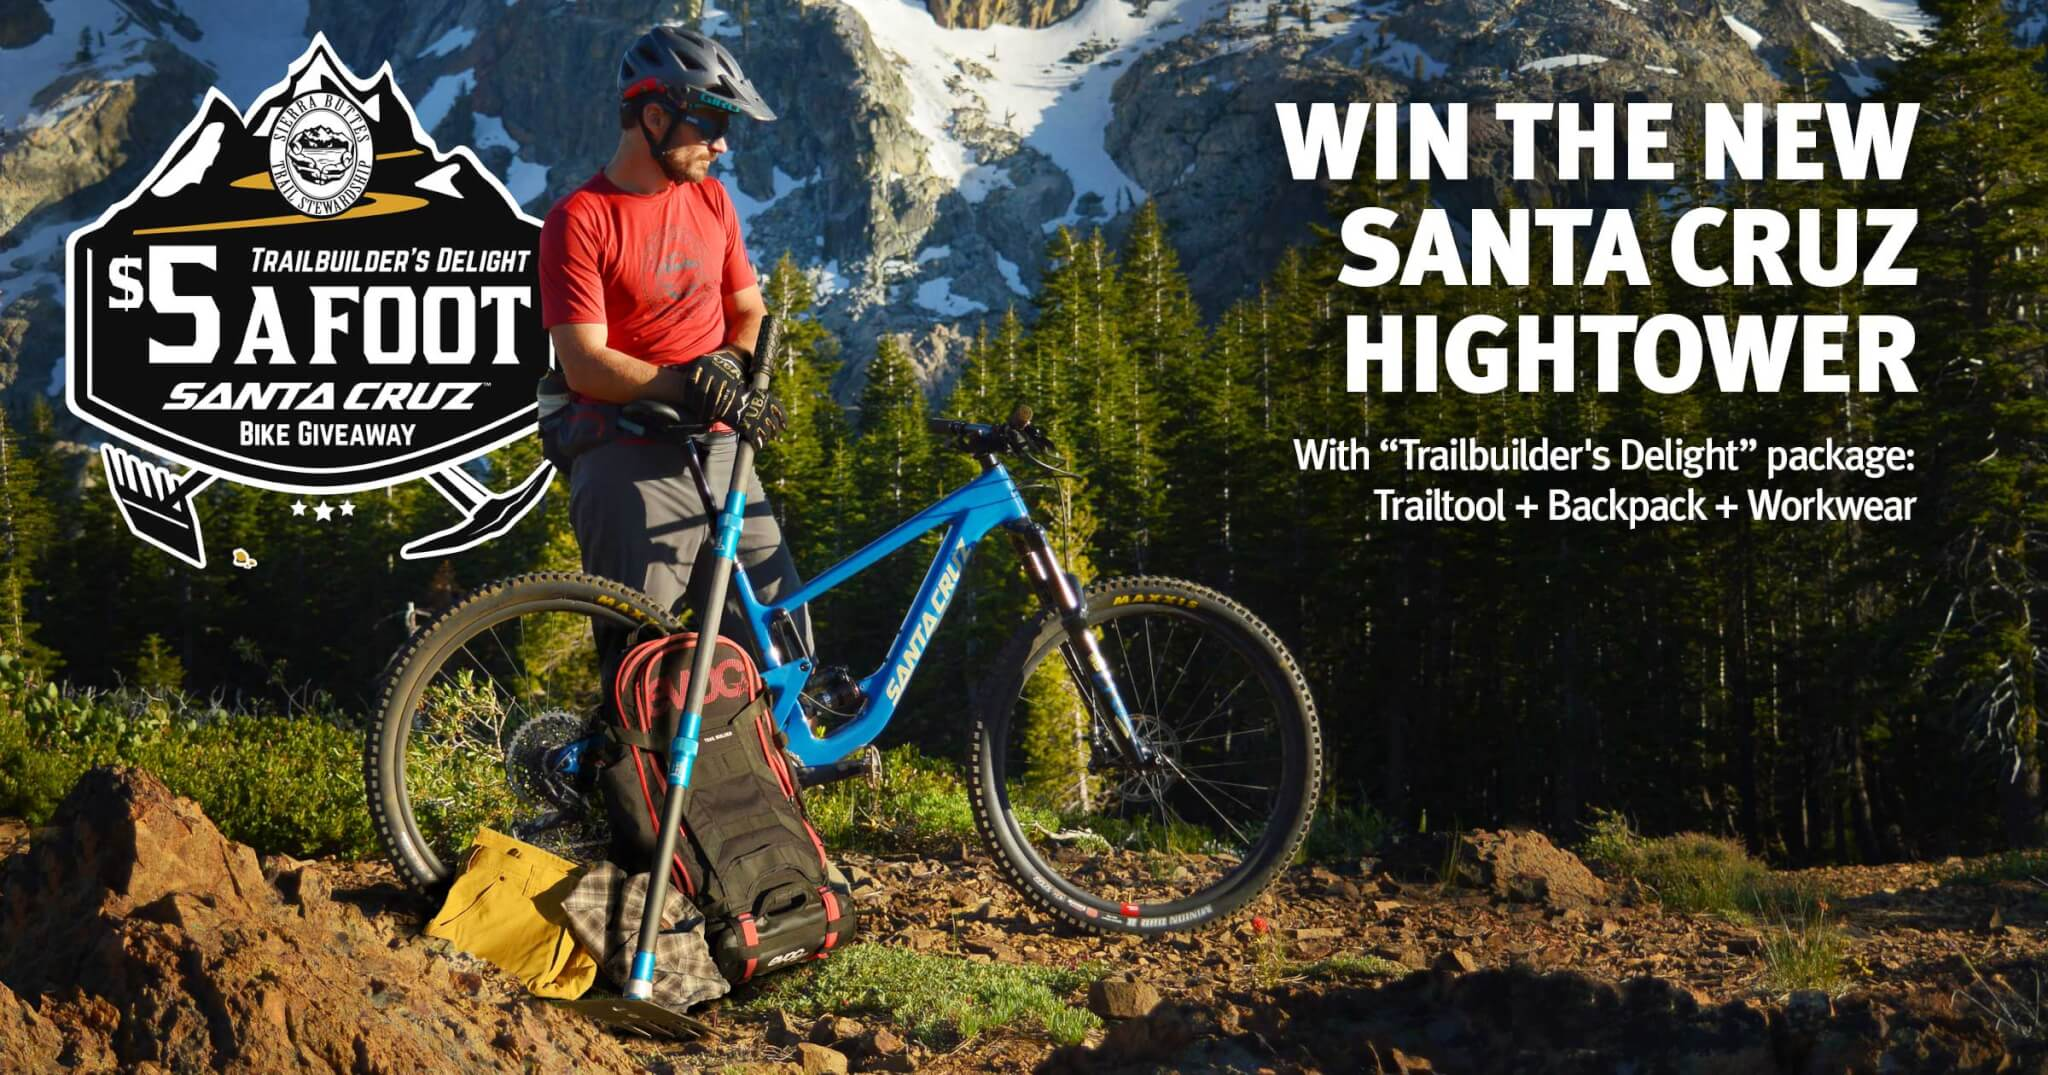 5 Bucks a Foot Fundraiser - Win the new Santa Cruz Hightower - Enter Here